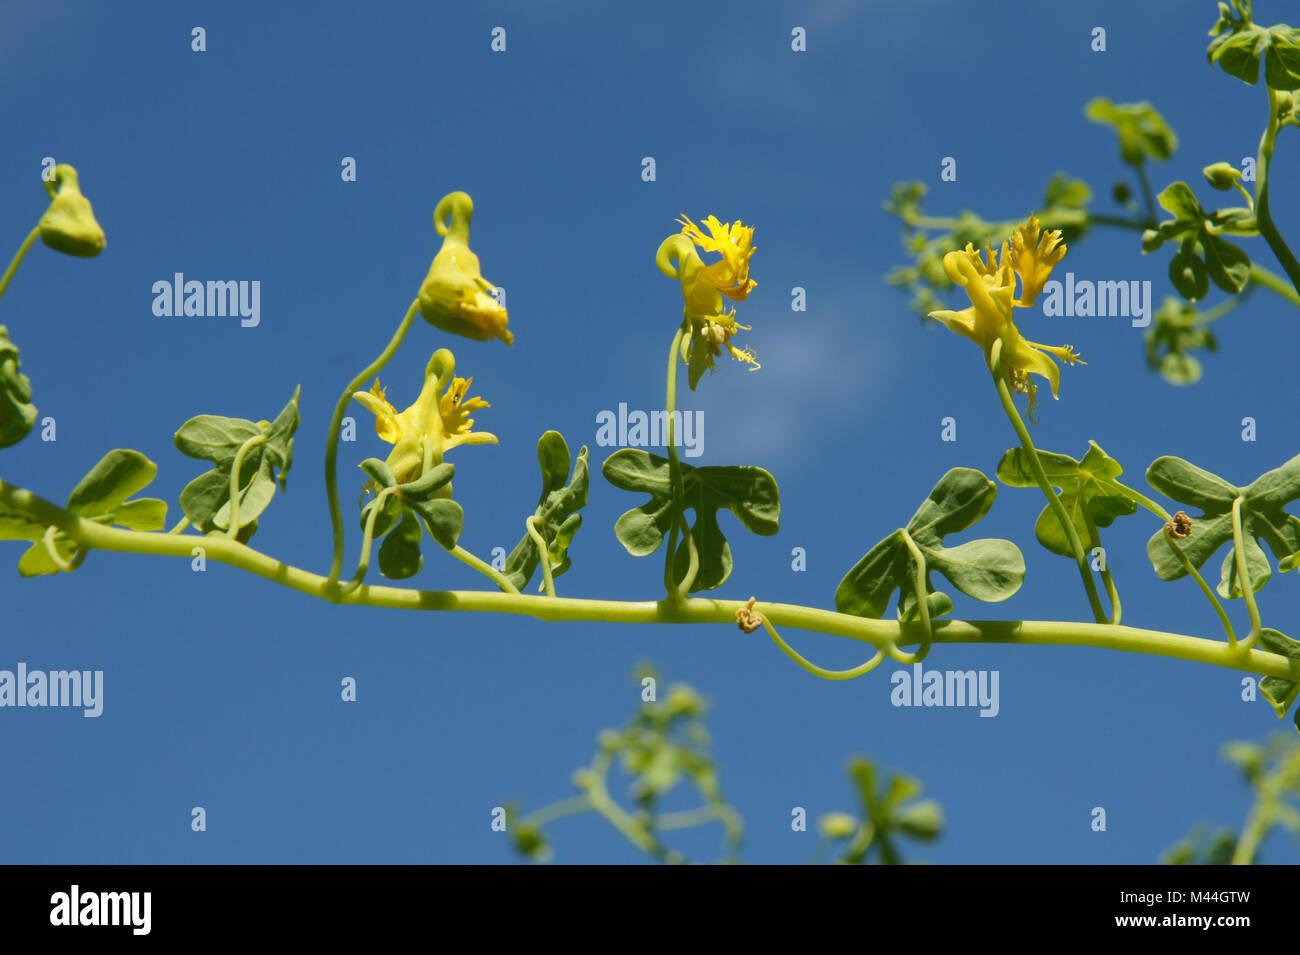 Tropaeolum peregrinum, Kanarische Kapuzinerkresse, canary creeper Stock Photo